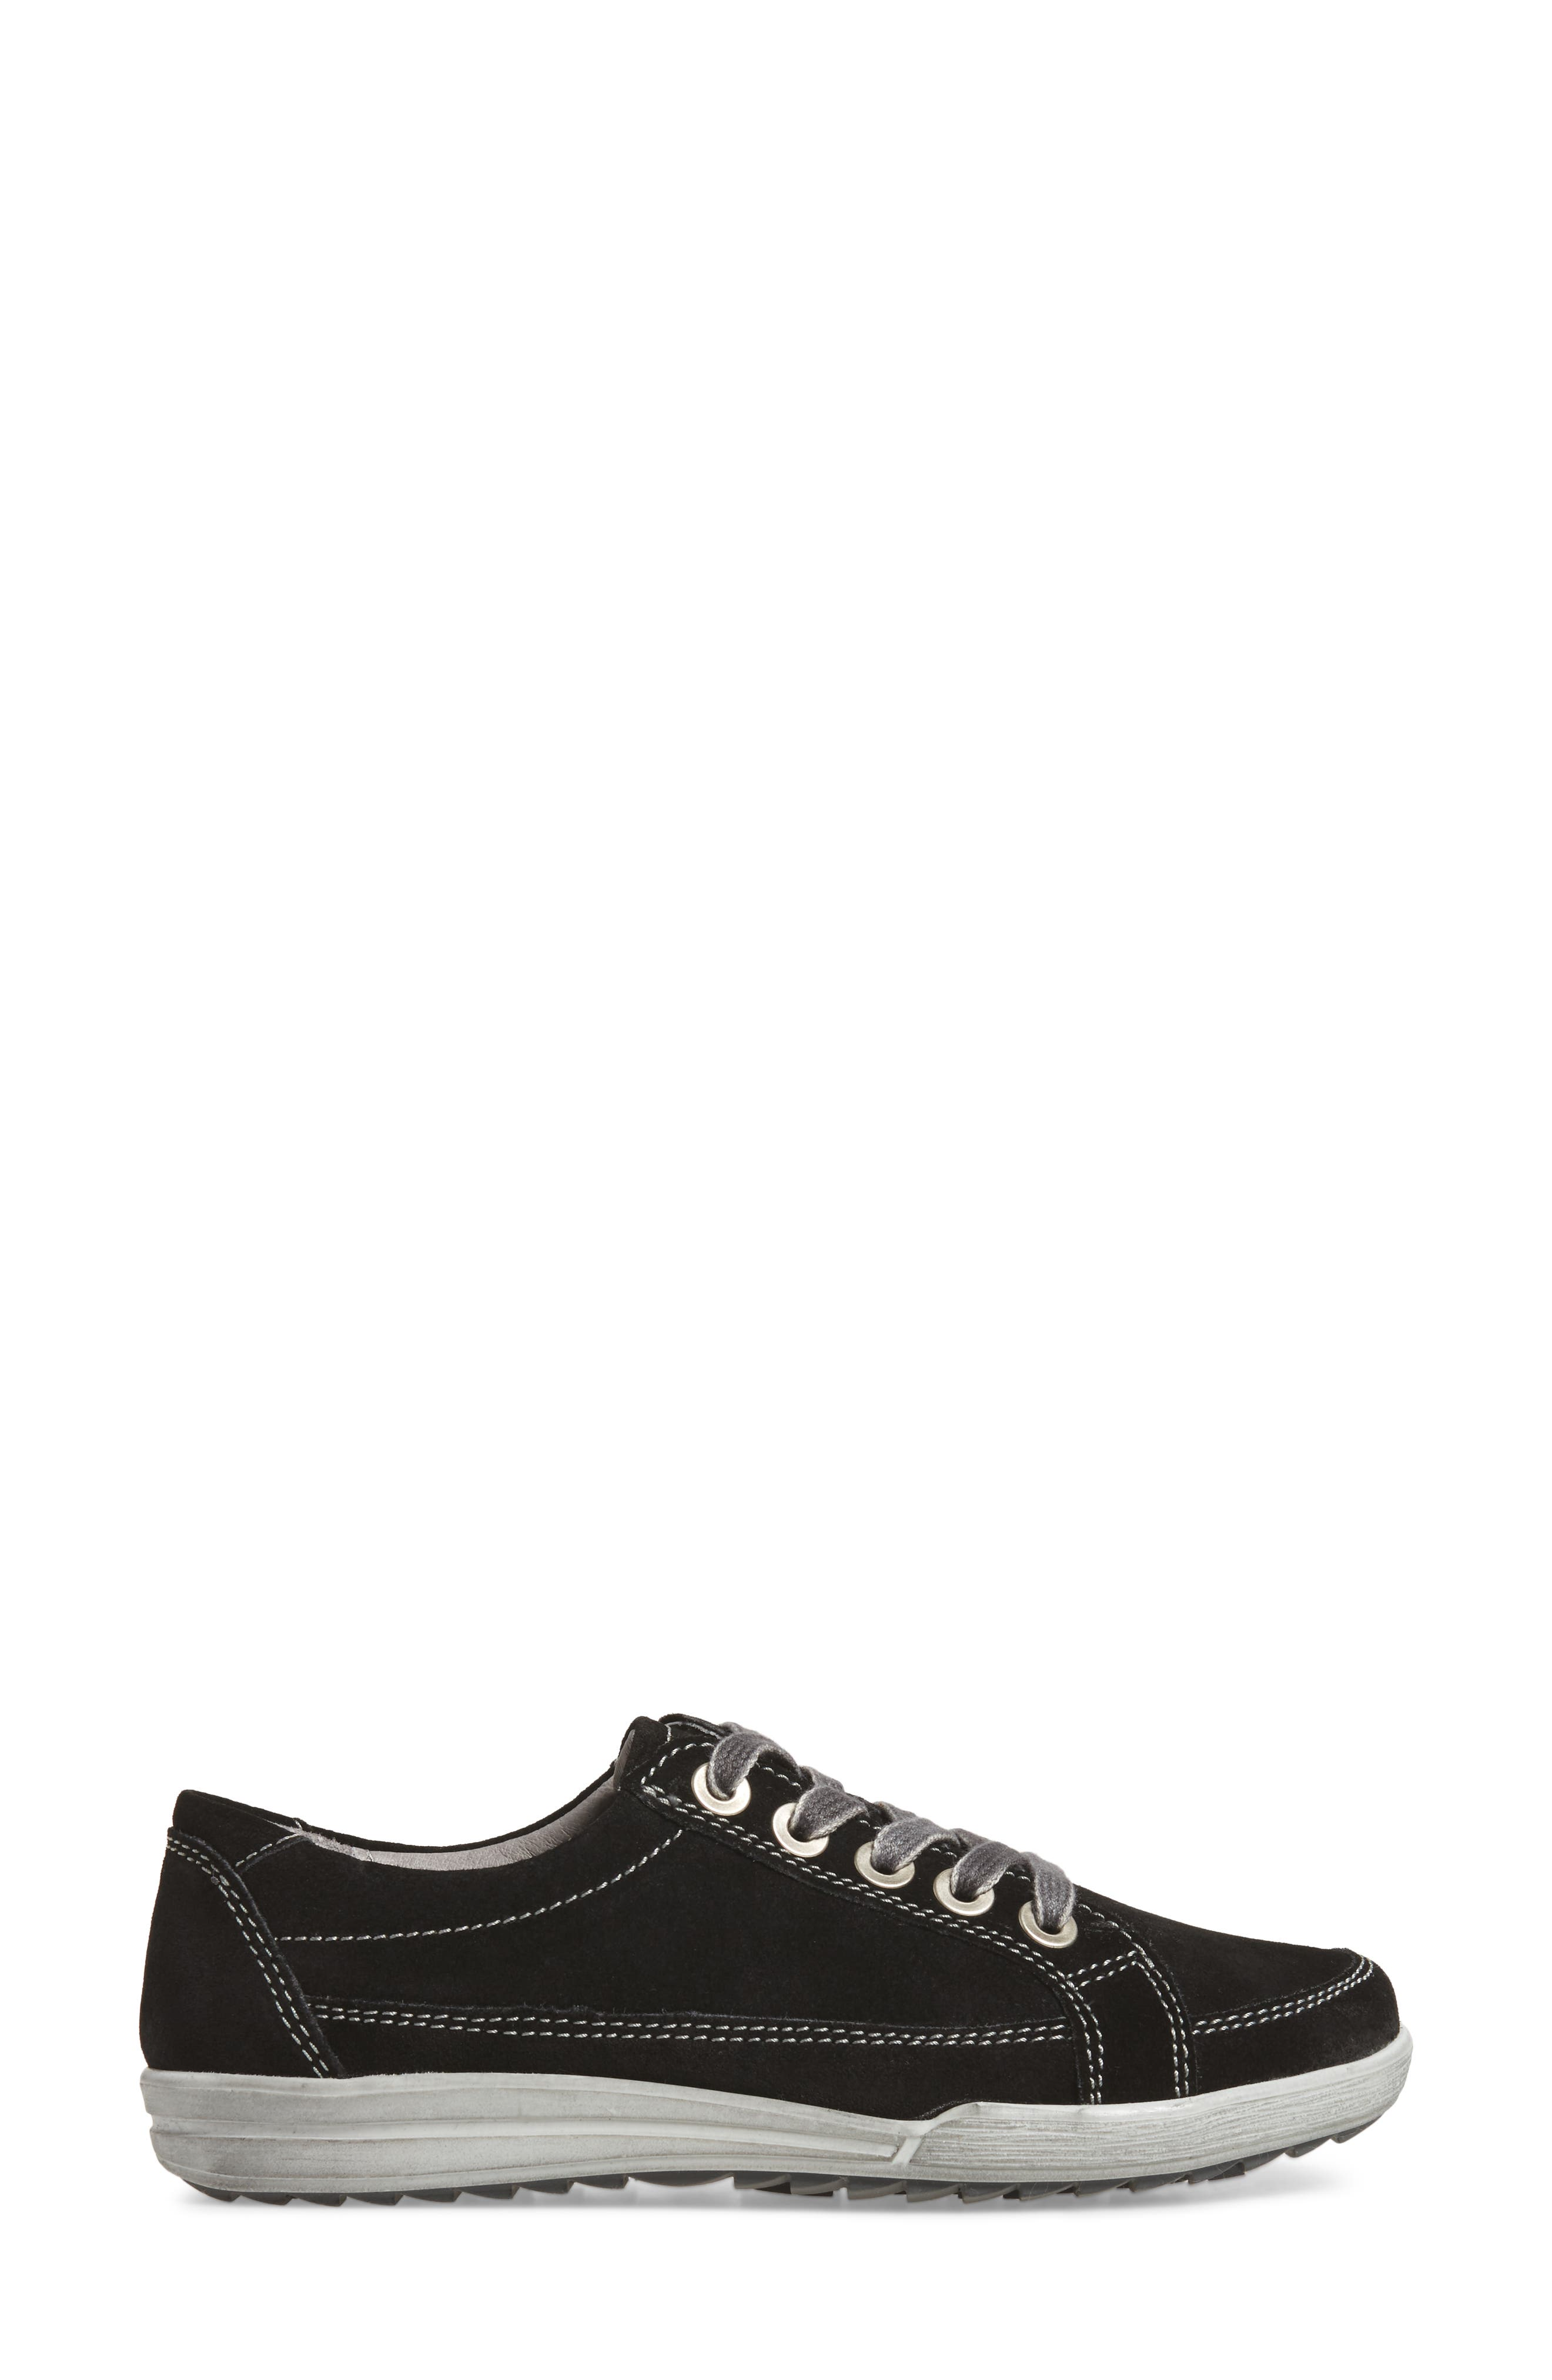 Dany 57 Sneaker,                             Alternate thumbnail 3, color,                             Black Leather